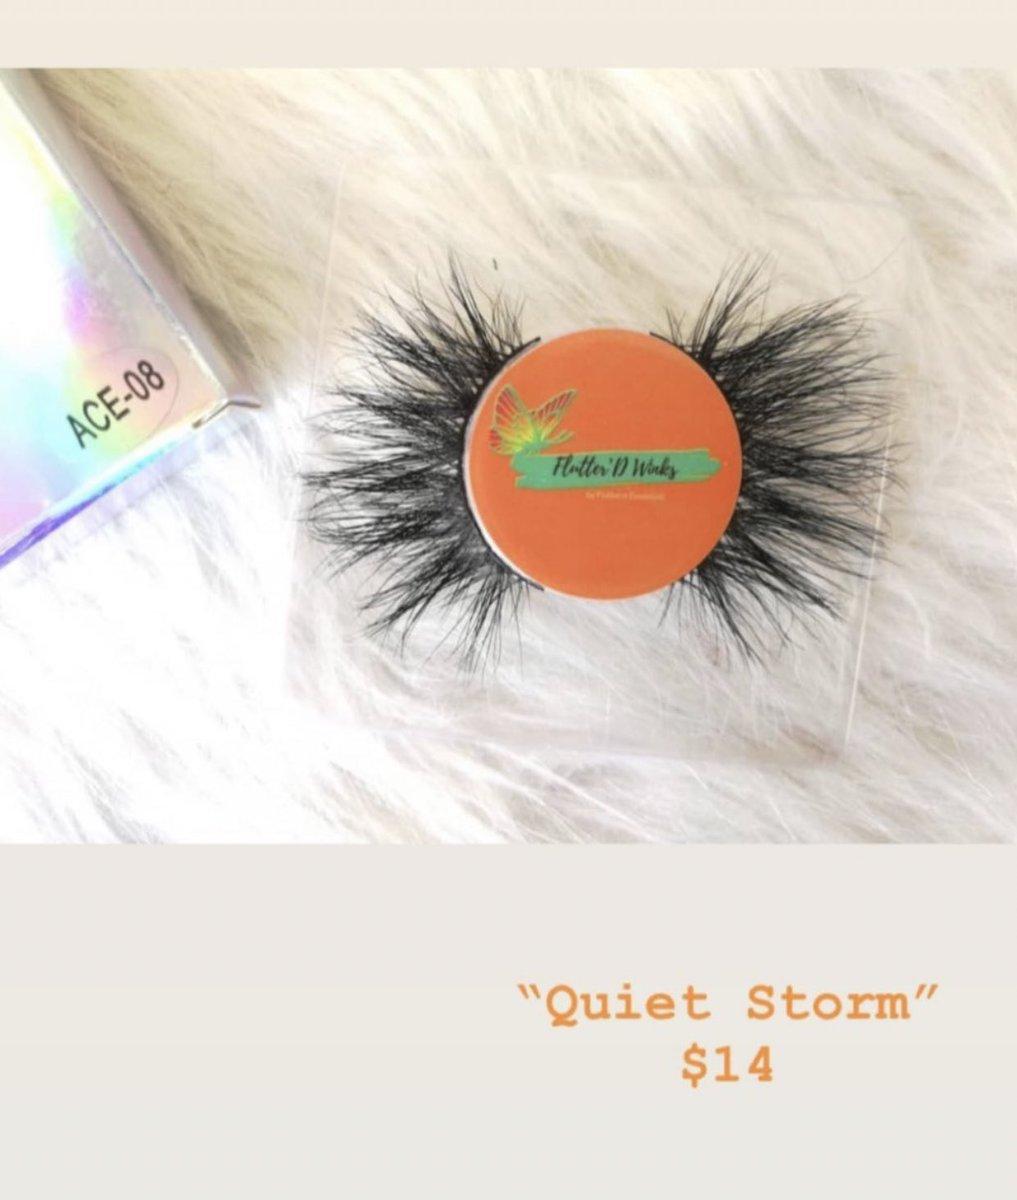 """Quiet Storm "" $14 COME SHOP LADIES Link To WEBSITE in BIO  CONTACT US  flutterd.essentials@gmail.com #lashbabes #minkeyelashstrips #dmvlashes #girlboss #makeup #girlboss #dmvmakeupartist #dmvmakeup #lashes #lashtechnician #minkstriplashes #makeupbrushes #comeshoppic.twitter.com/tNxVqRAJxj"